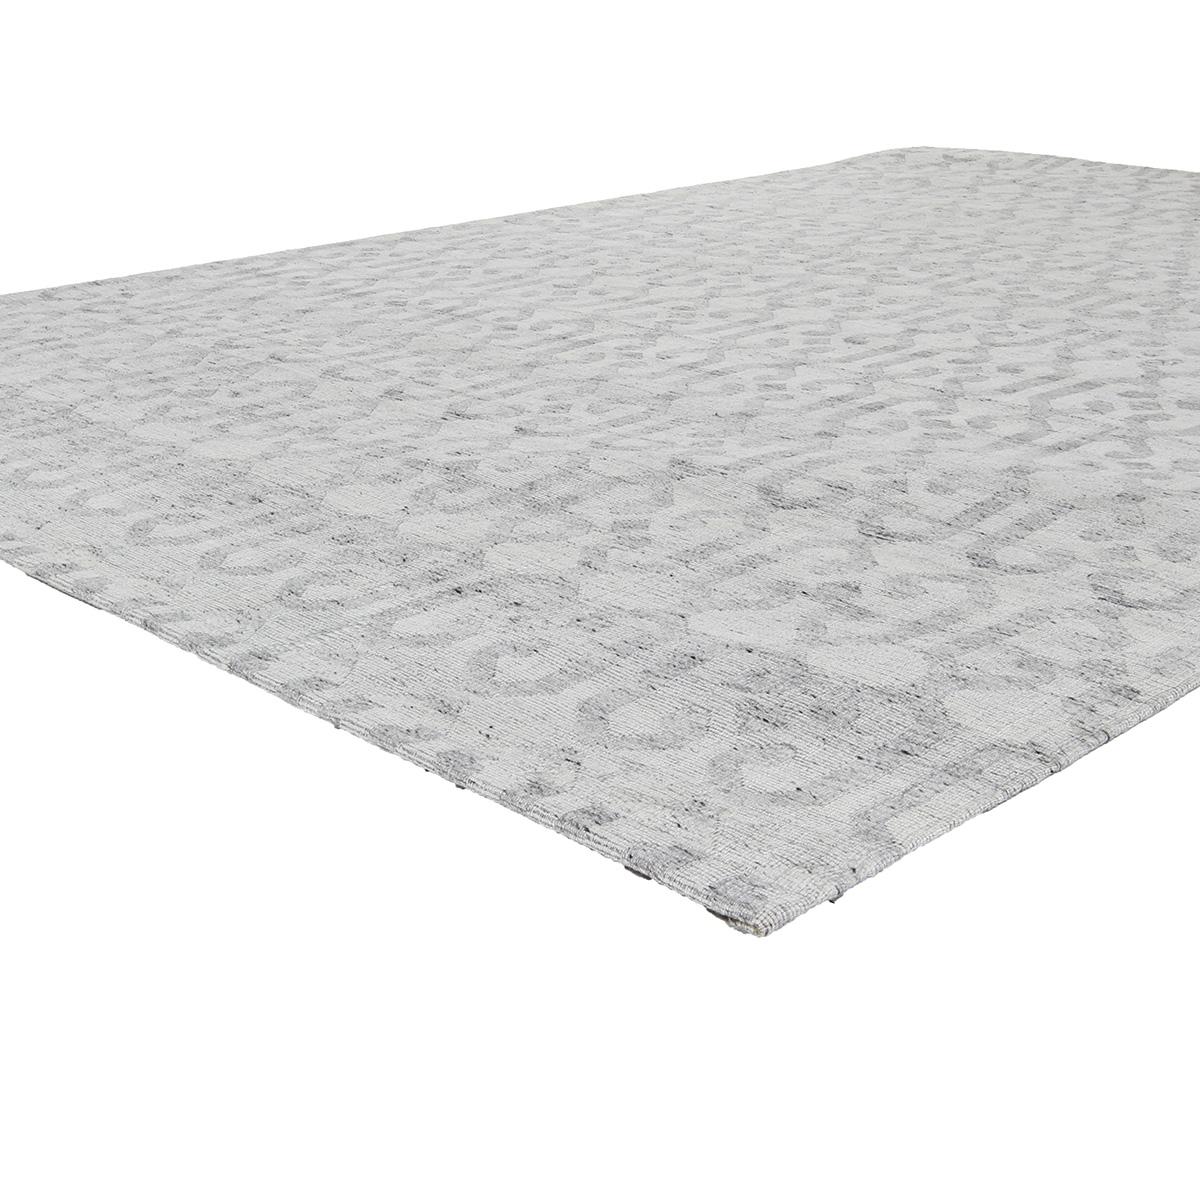 Vloerkleed Brinker Jera Silver | 160 x 230 cm